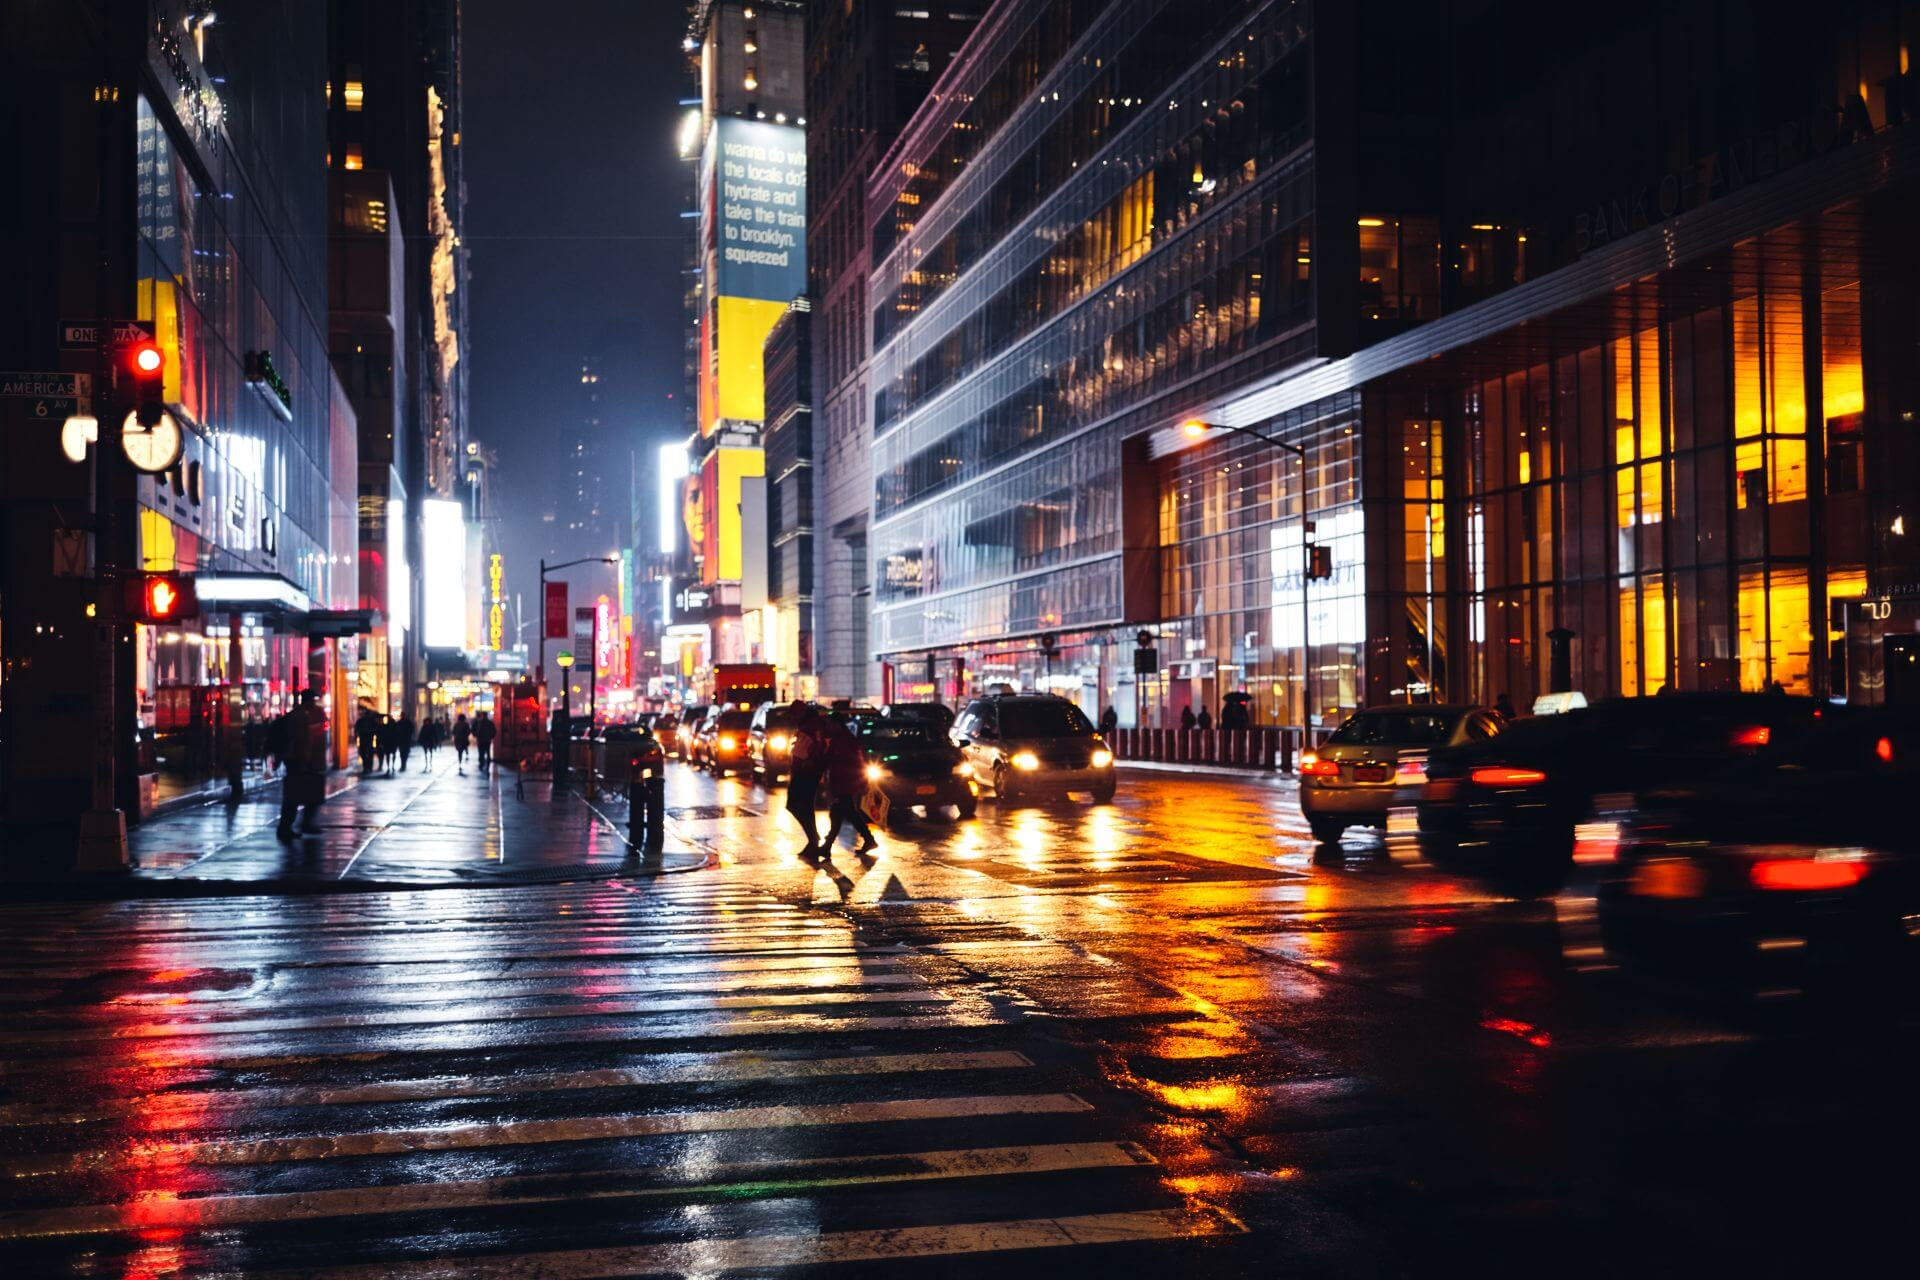 https://sleeklens.com/wp-content/uploads/2020/01/New-York-by-Night-After.jpg